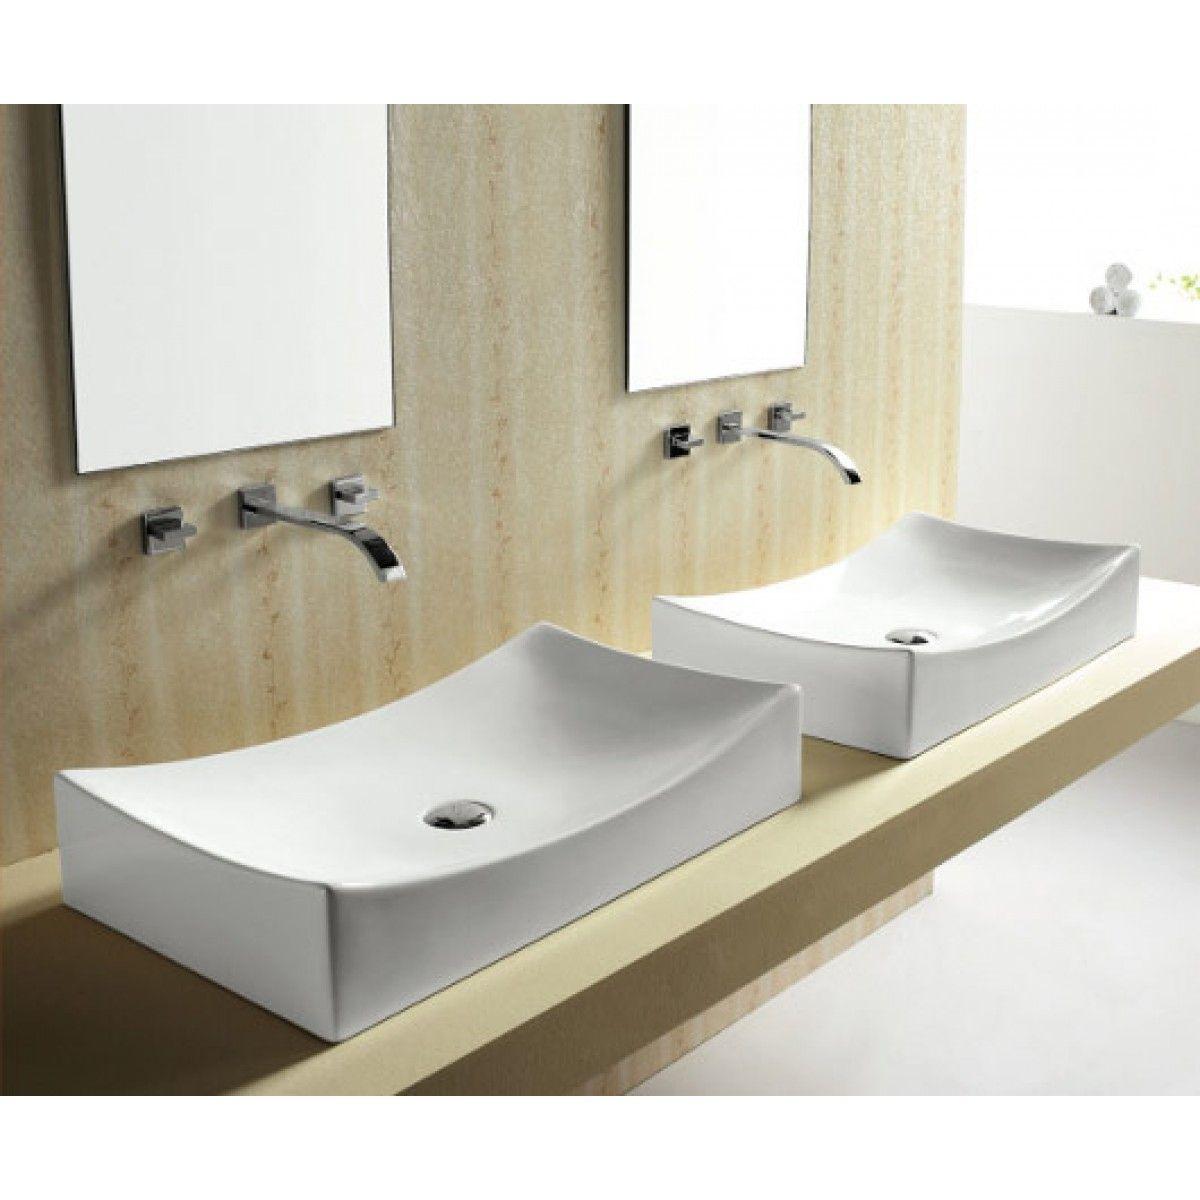 Charmant European Style Bathroom Sinks